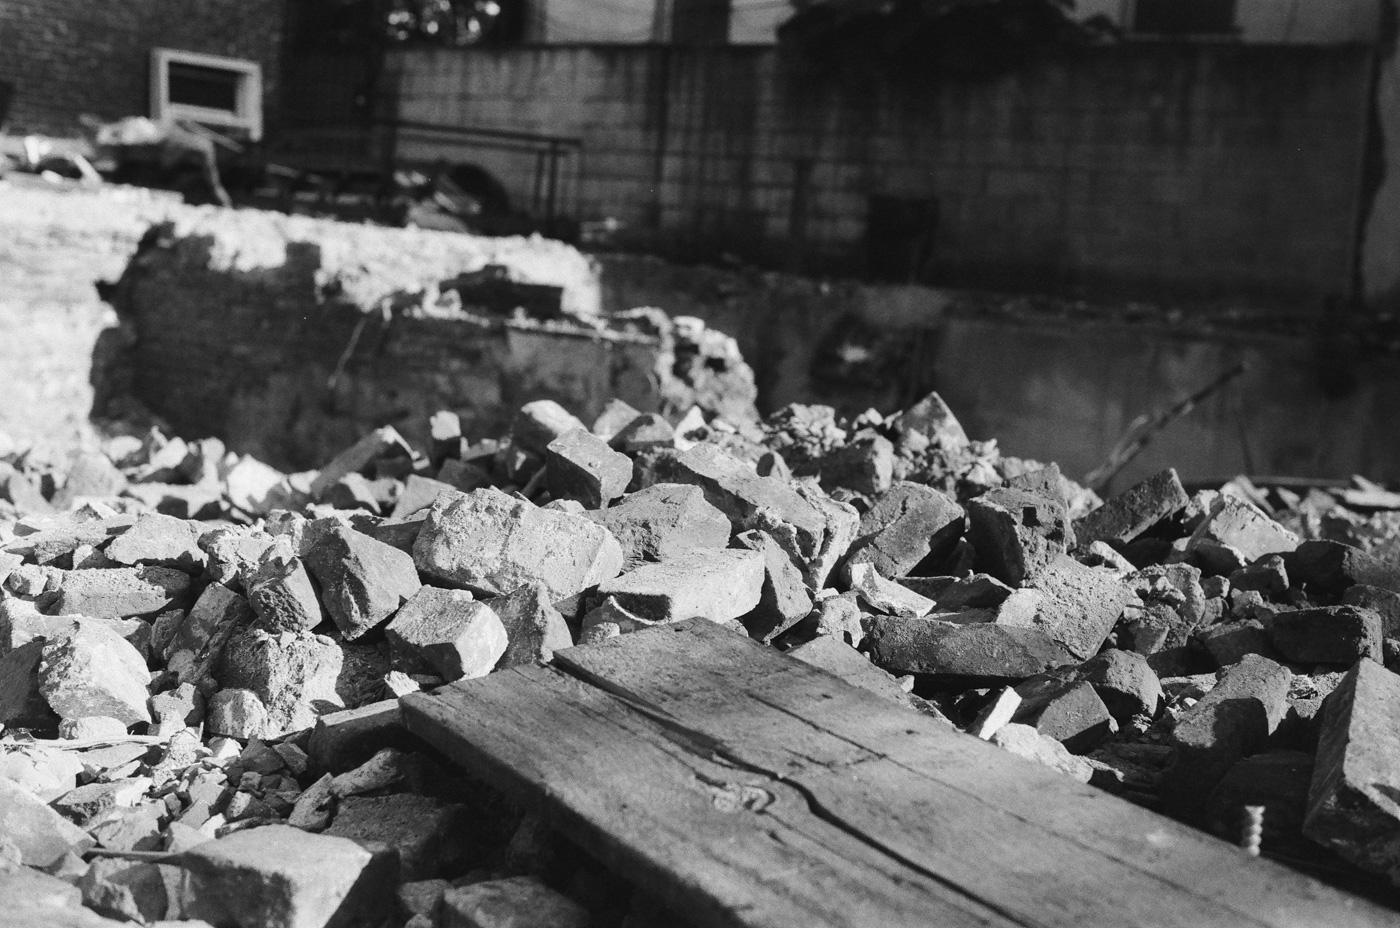 Wood and Bricks